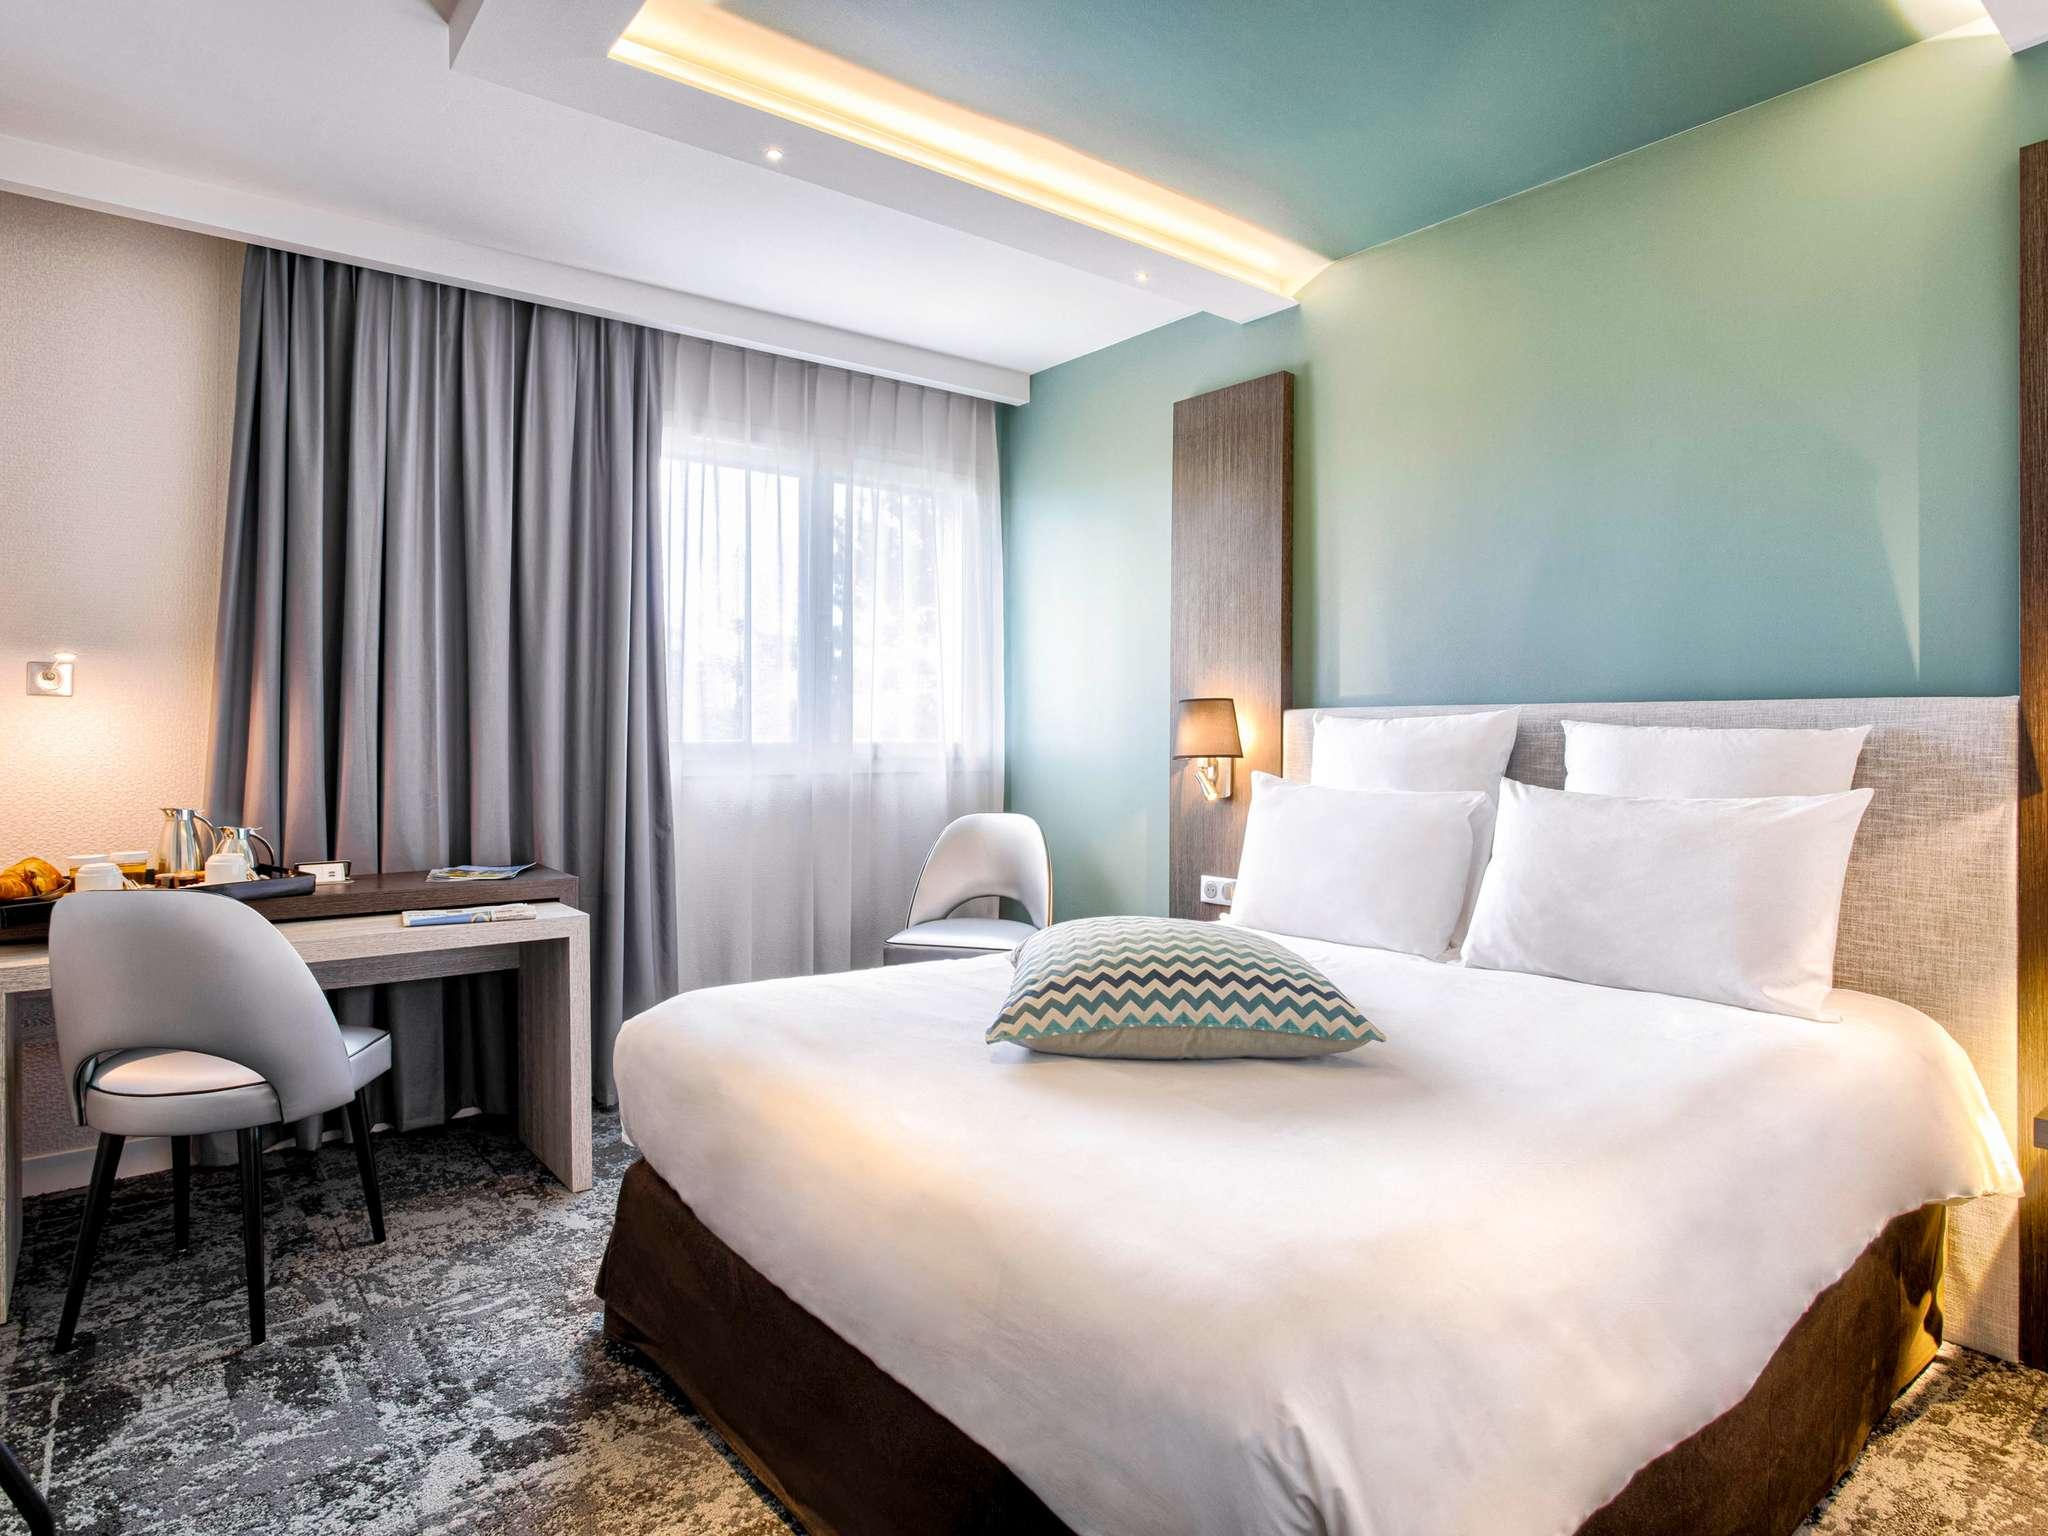 Hotel – Hôtel Mercure Cabourg Hippodrome